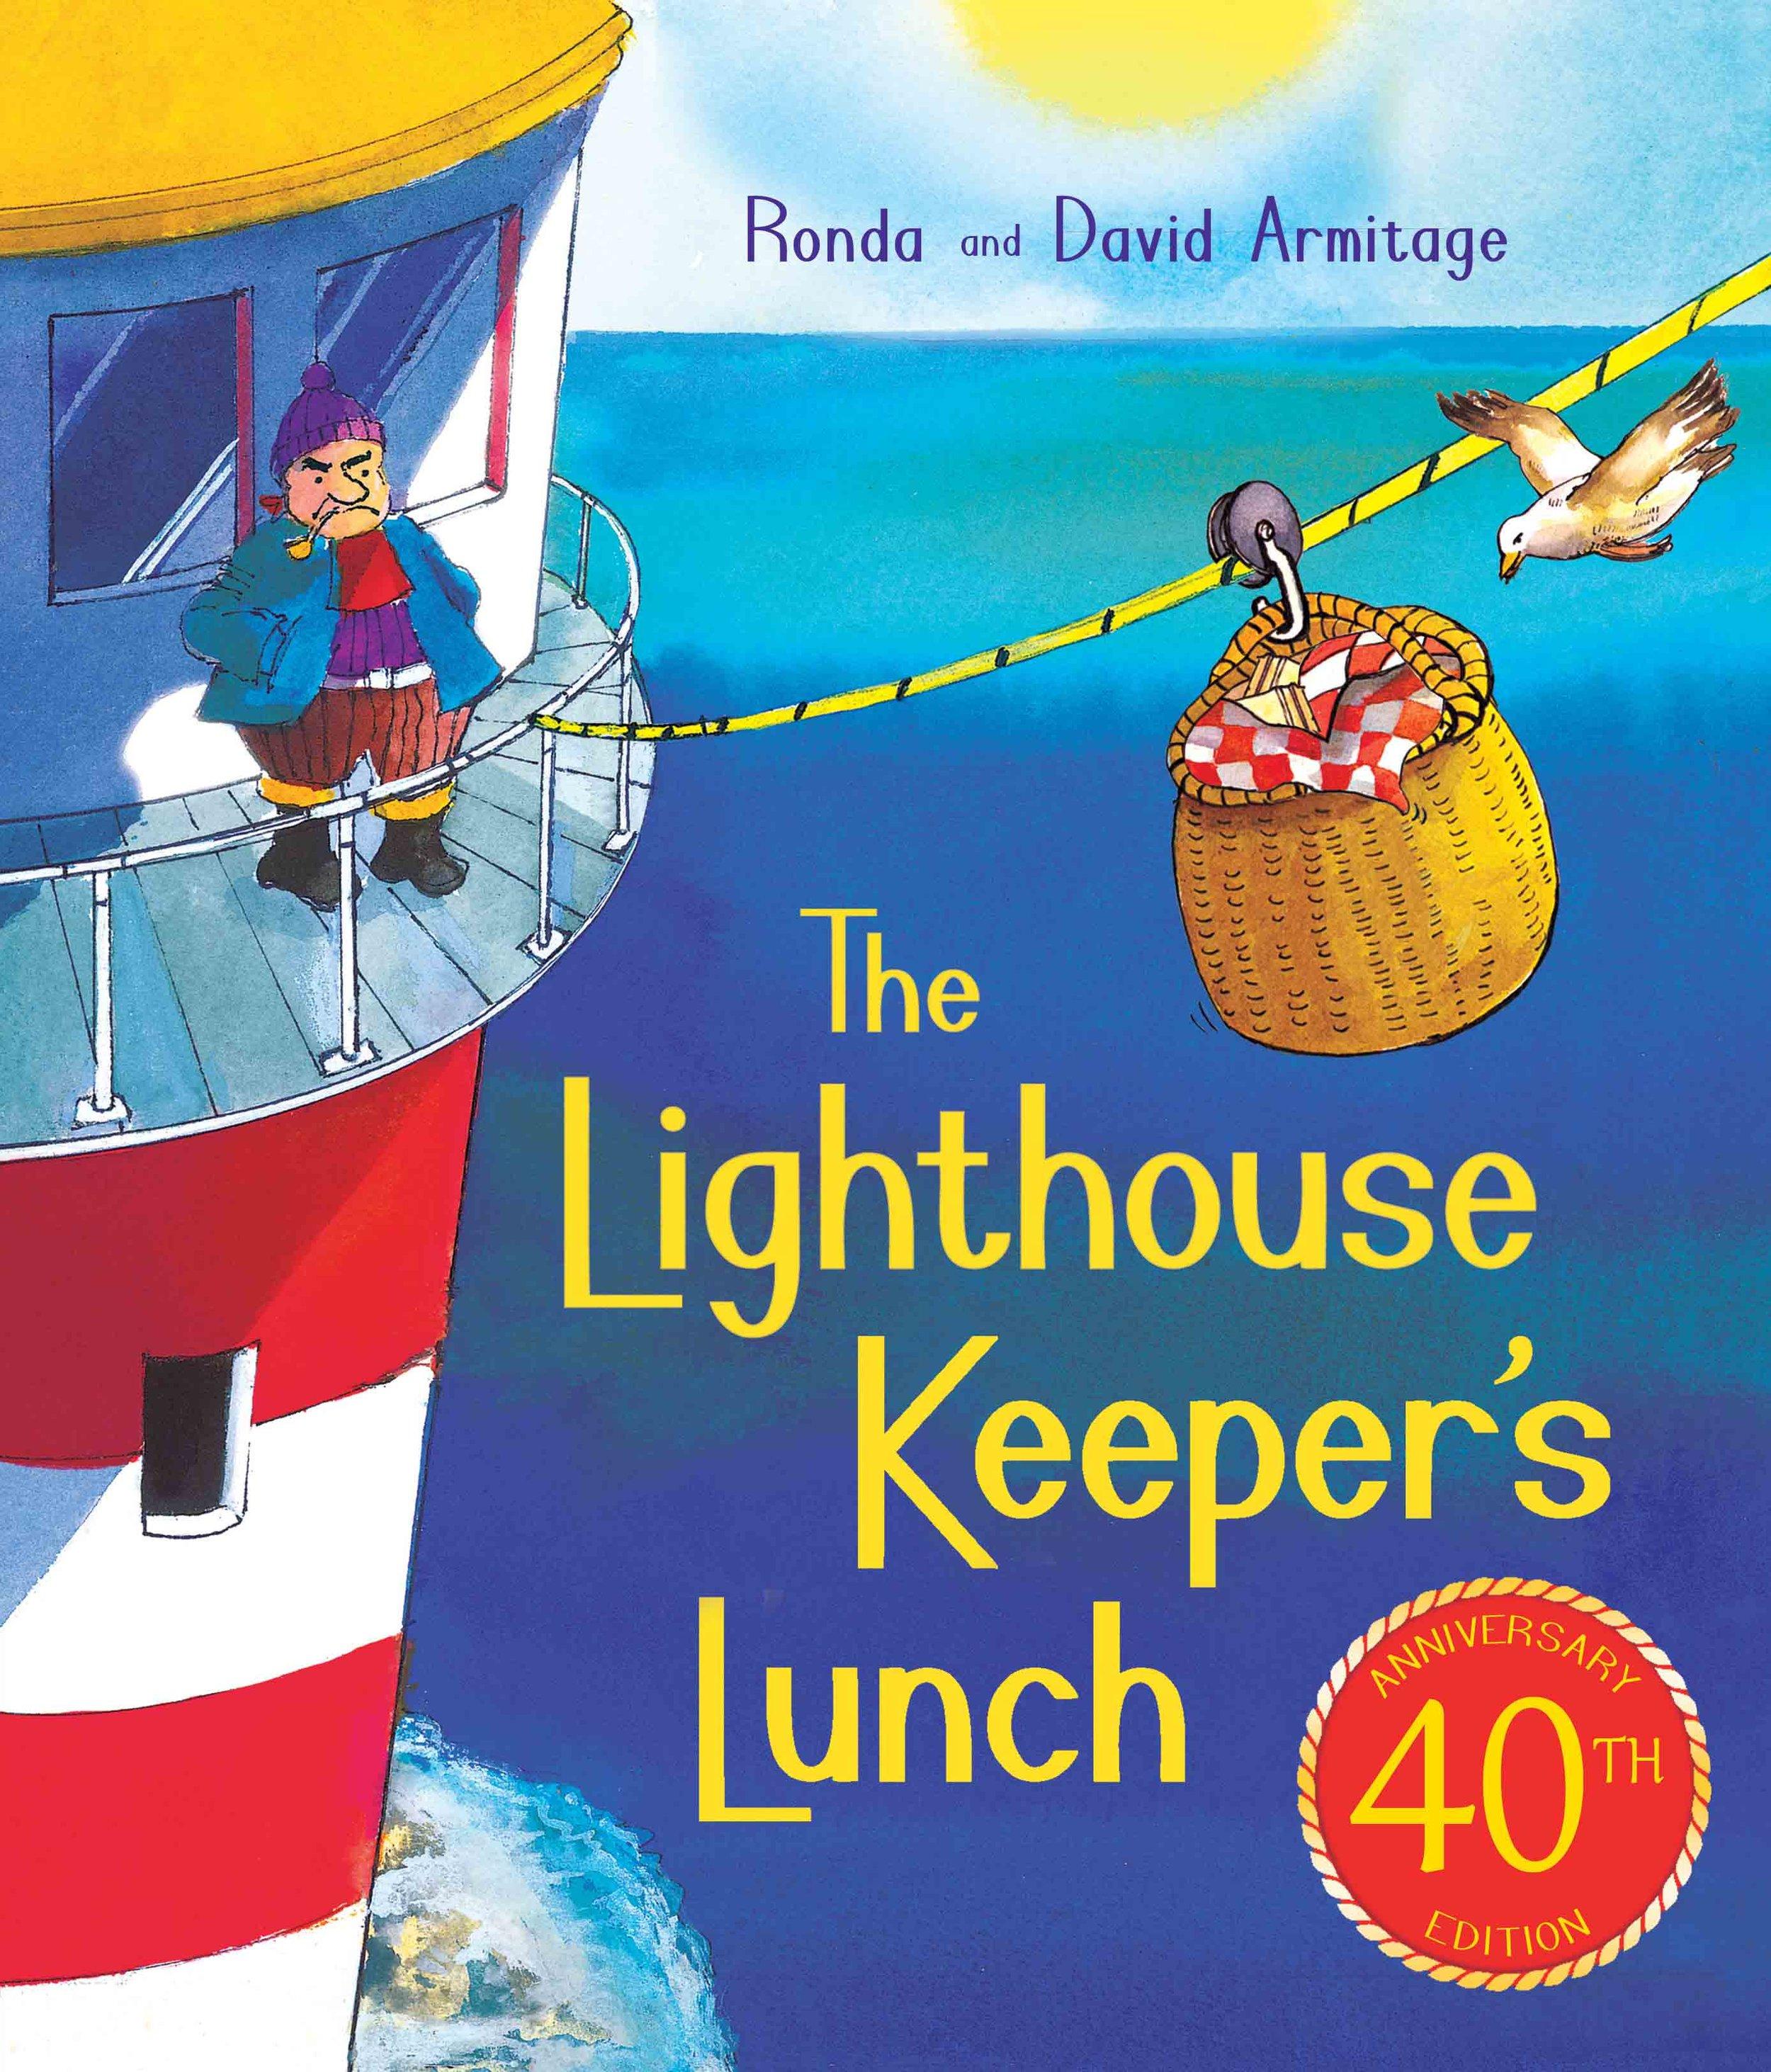 LightKeep_Lunch40th (1).jpg